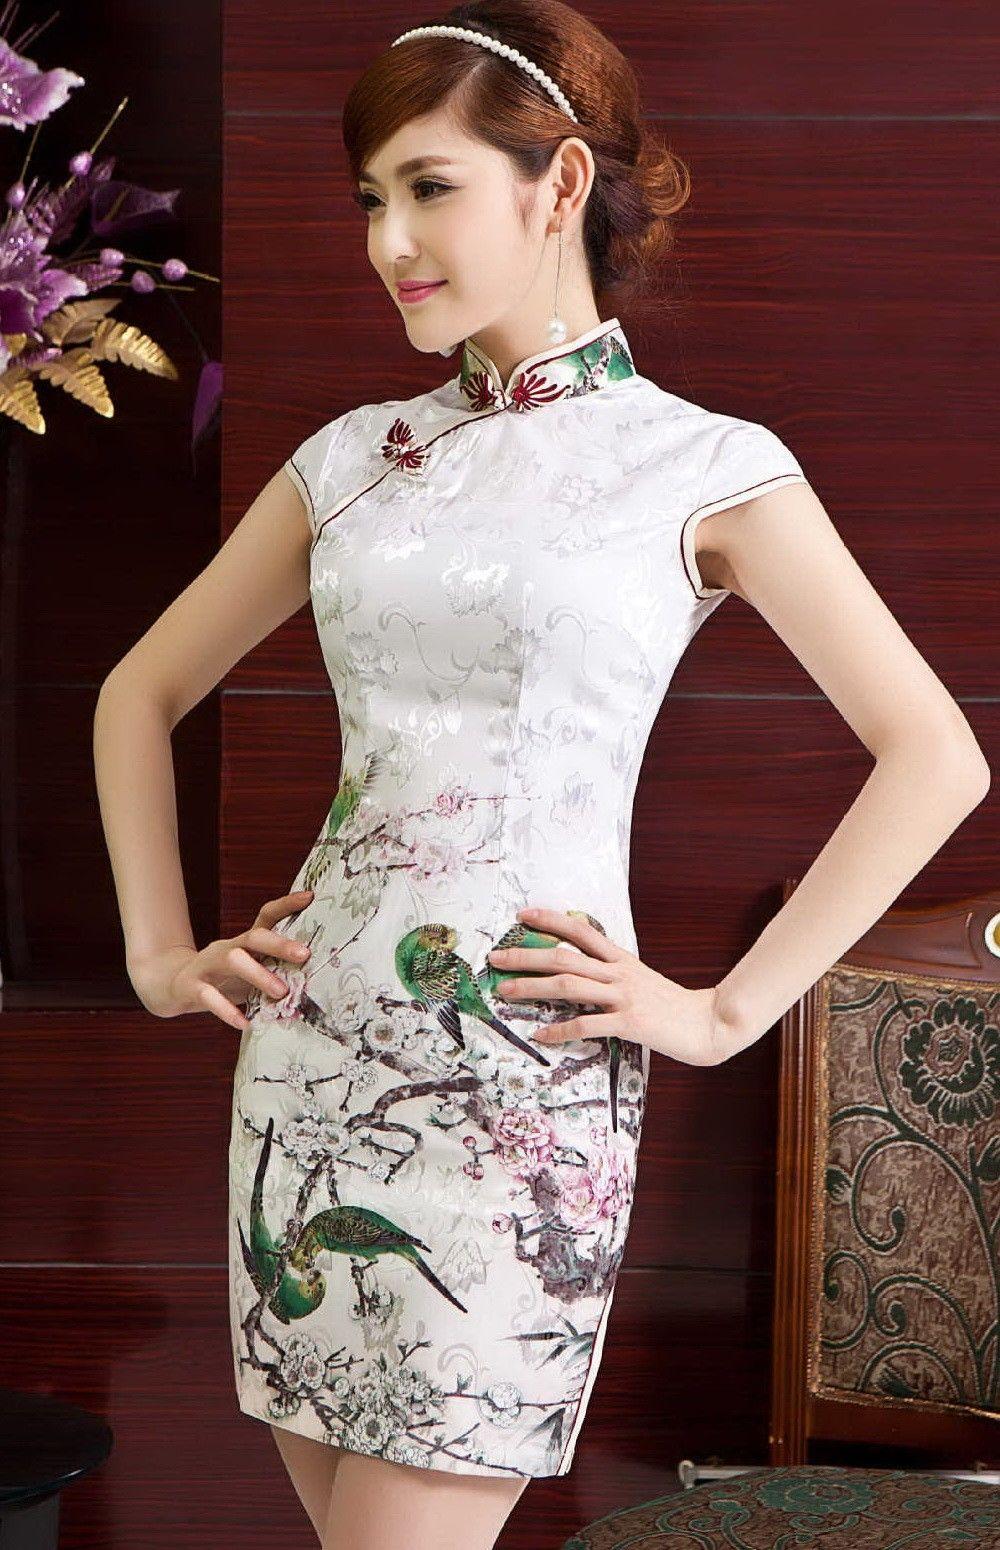 Idreammart Chinesedress Dress Cheongsam Qipao Freeshipping Elegant Cotton Flowers Birds Print V Chinese Dress Fashion Clothes Women Traditional Dresses [ 1550 x 1000 Pixel ]